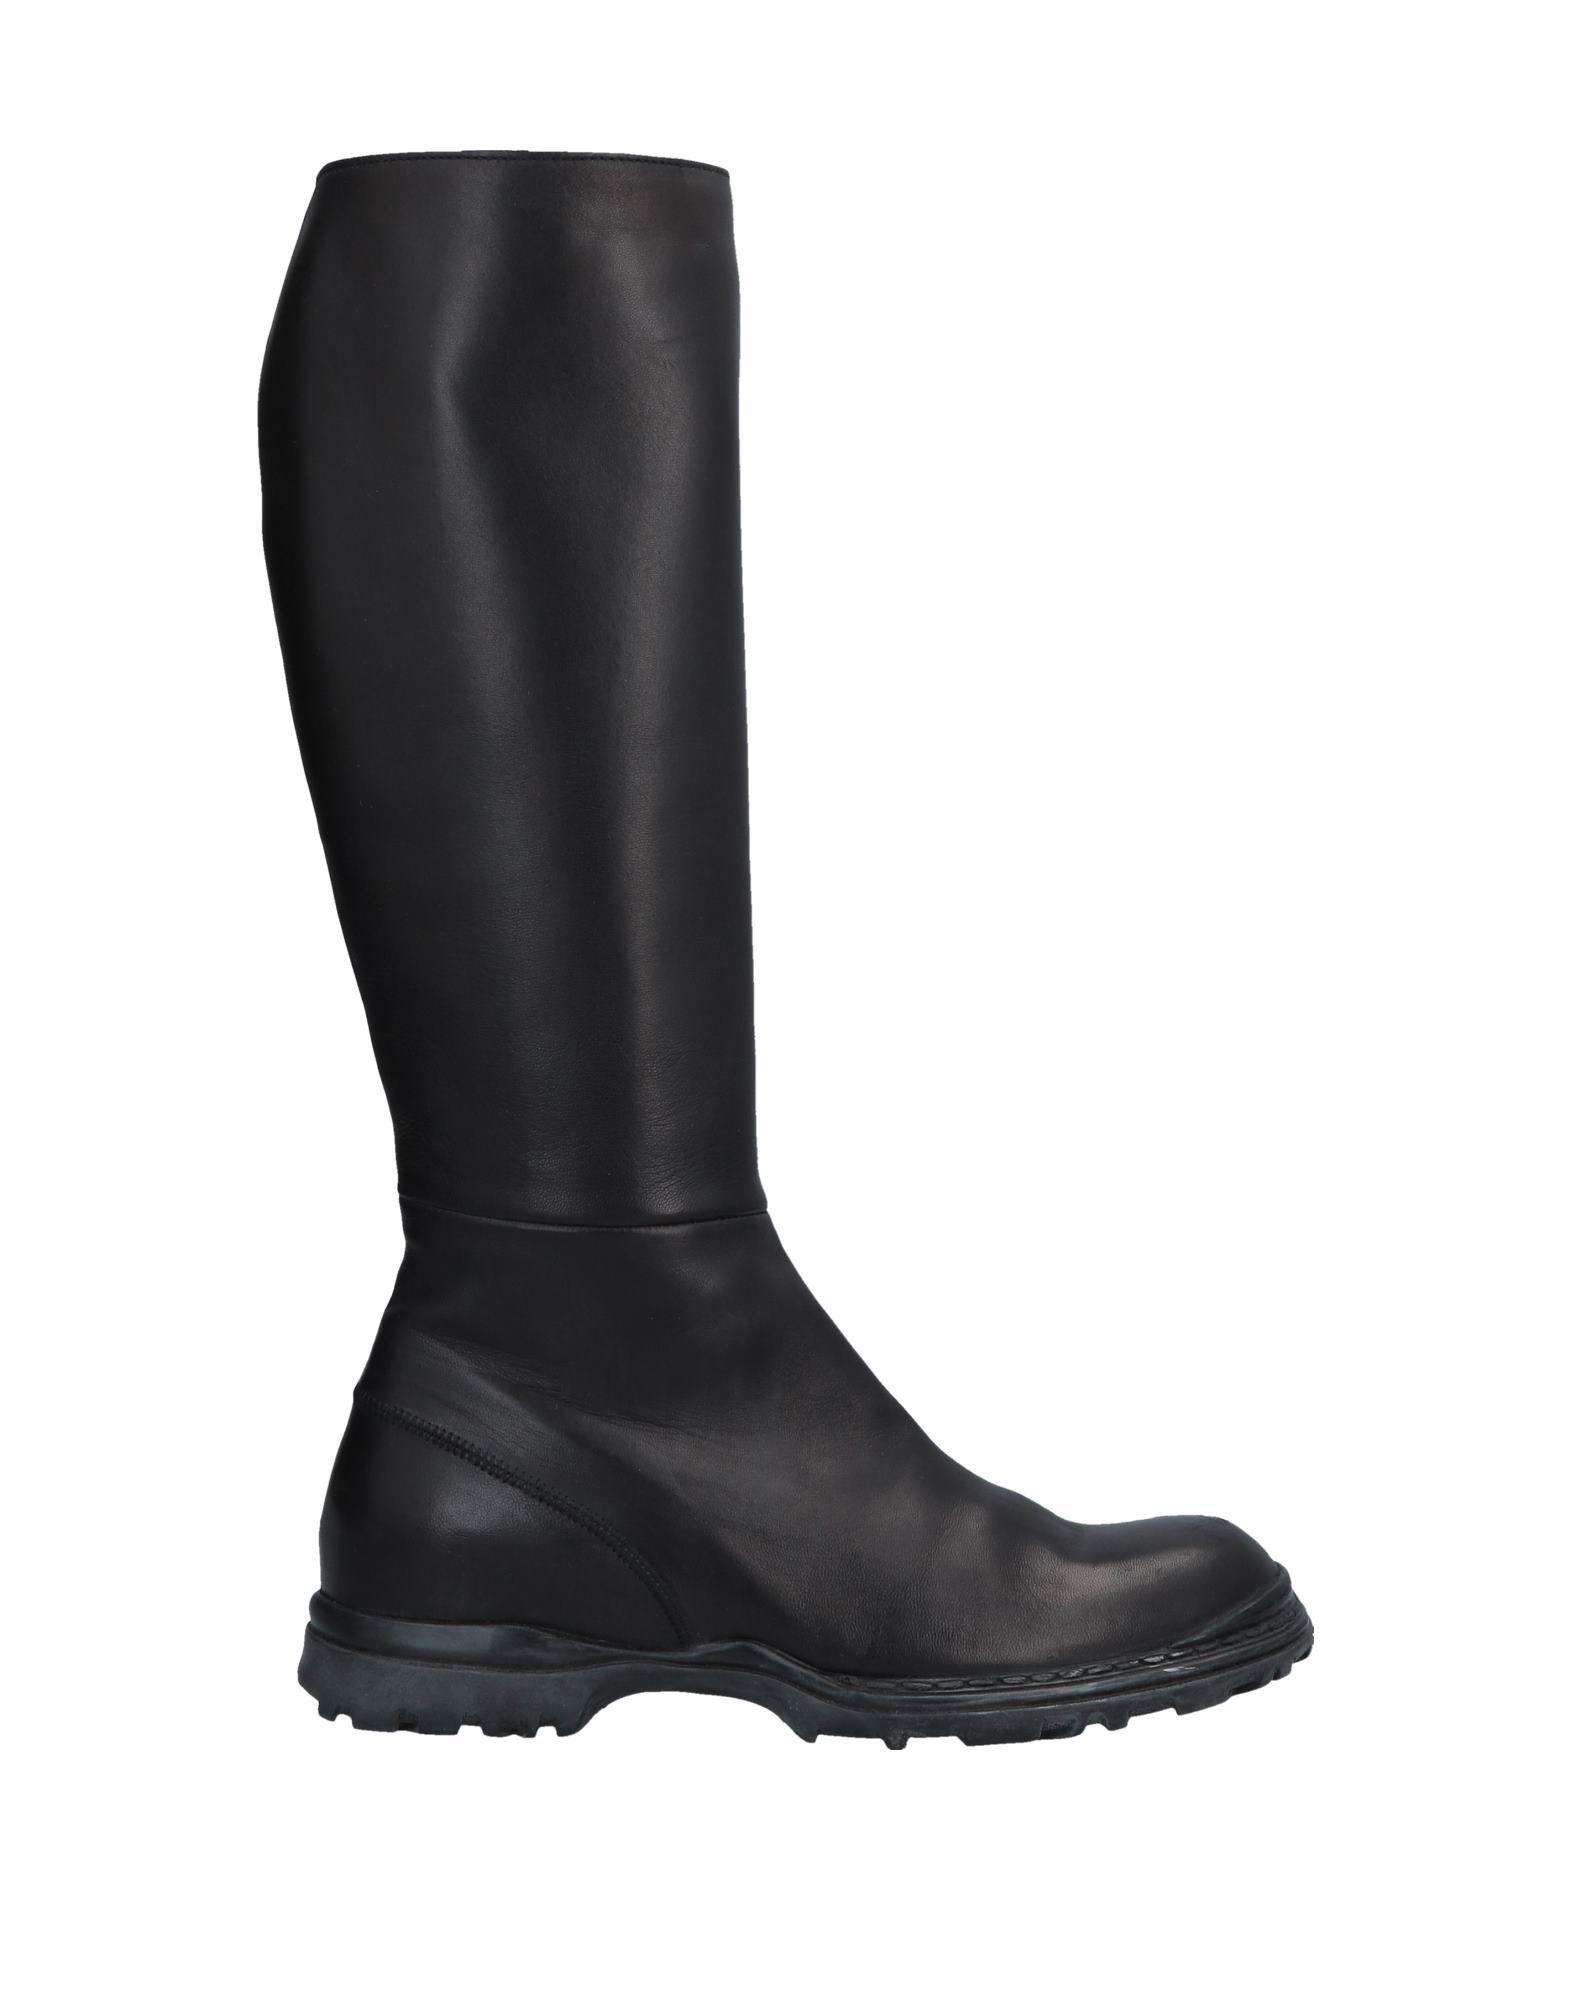 Stiefel Costume National damen - 11607873WV